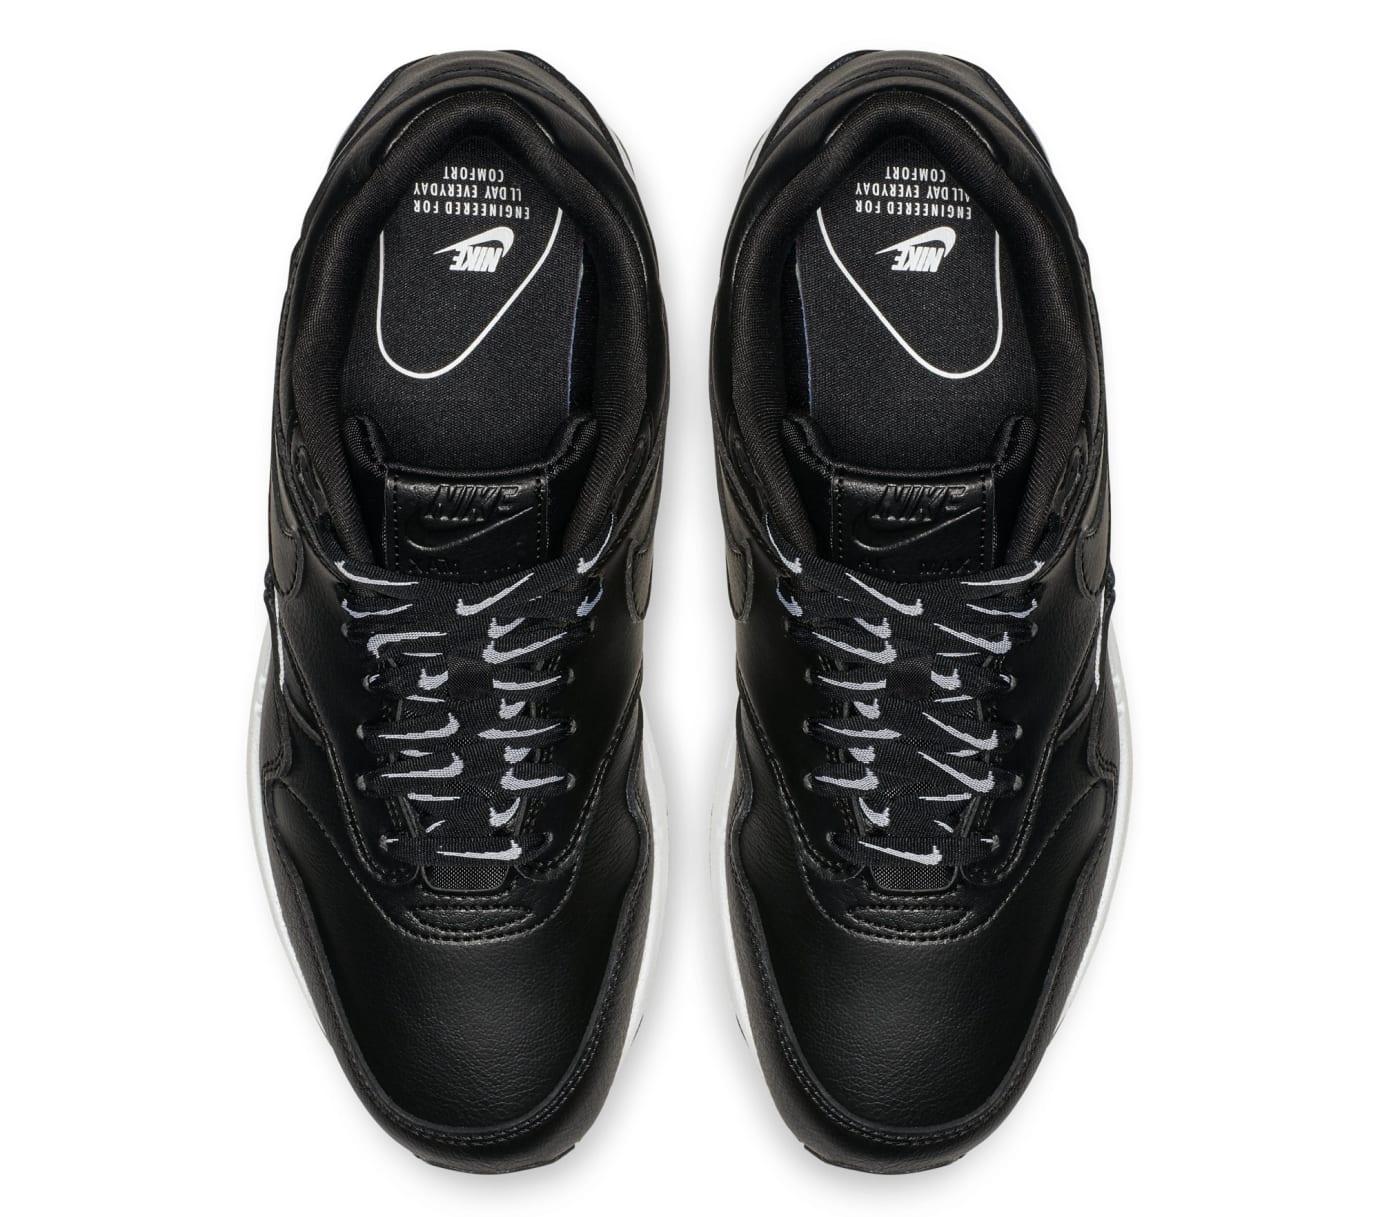 Nike Air Max 1 SE WMNS 881101-005 (Top)